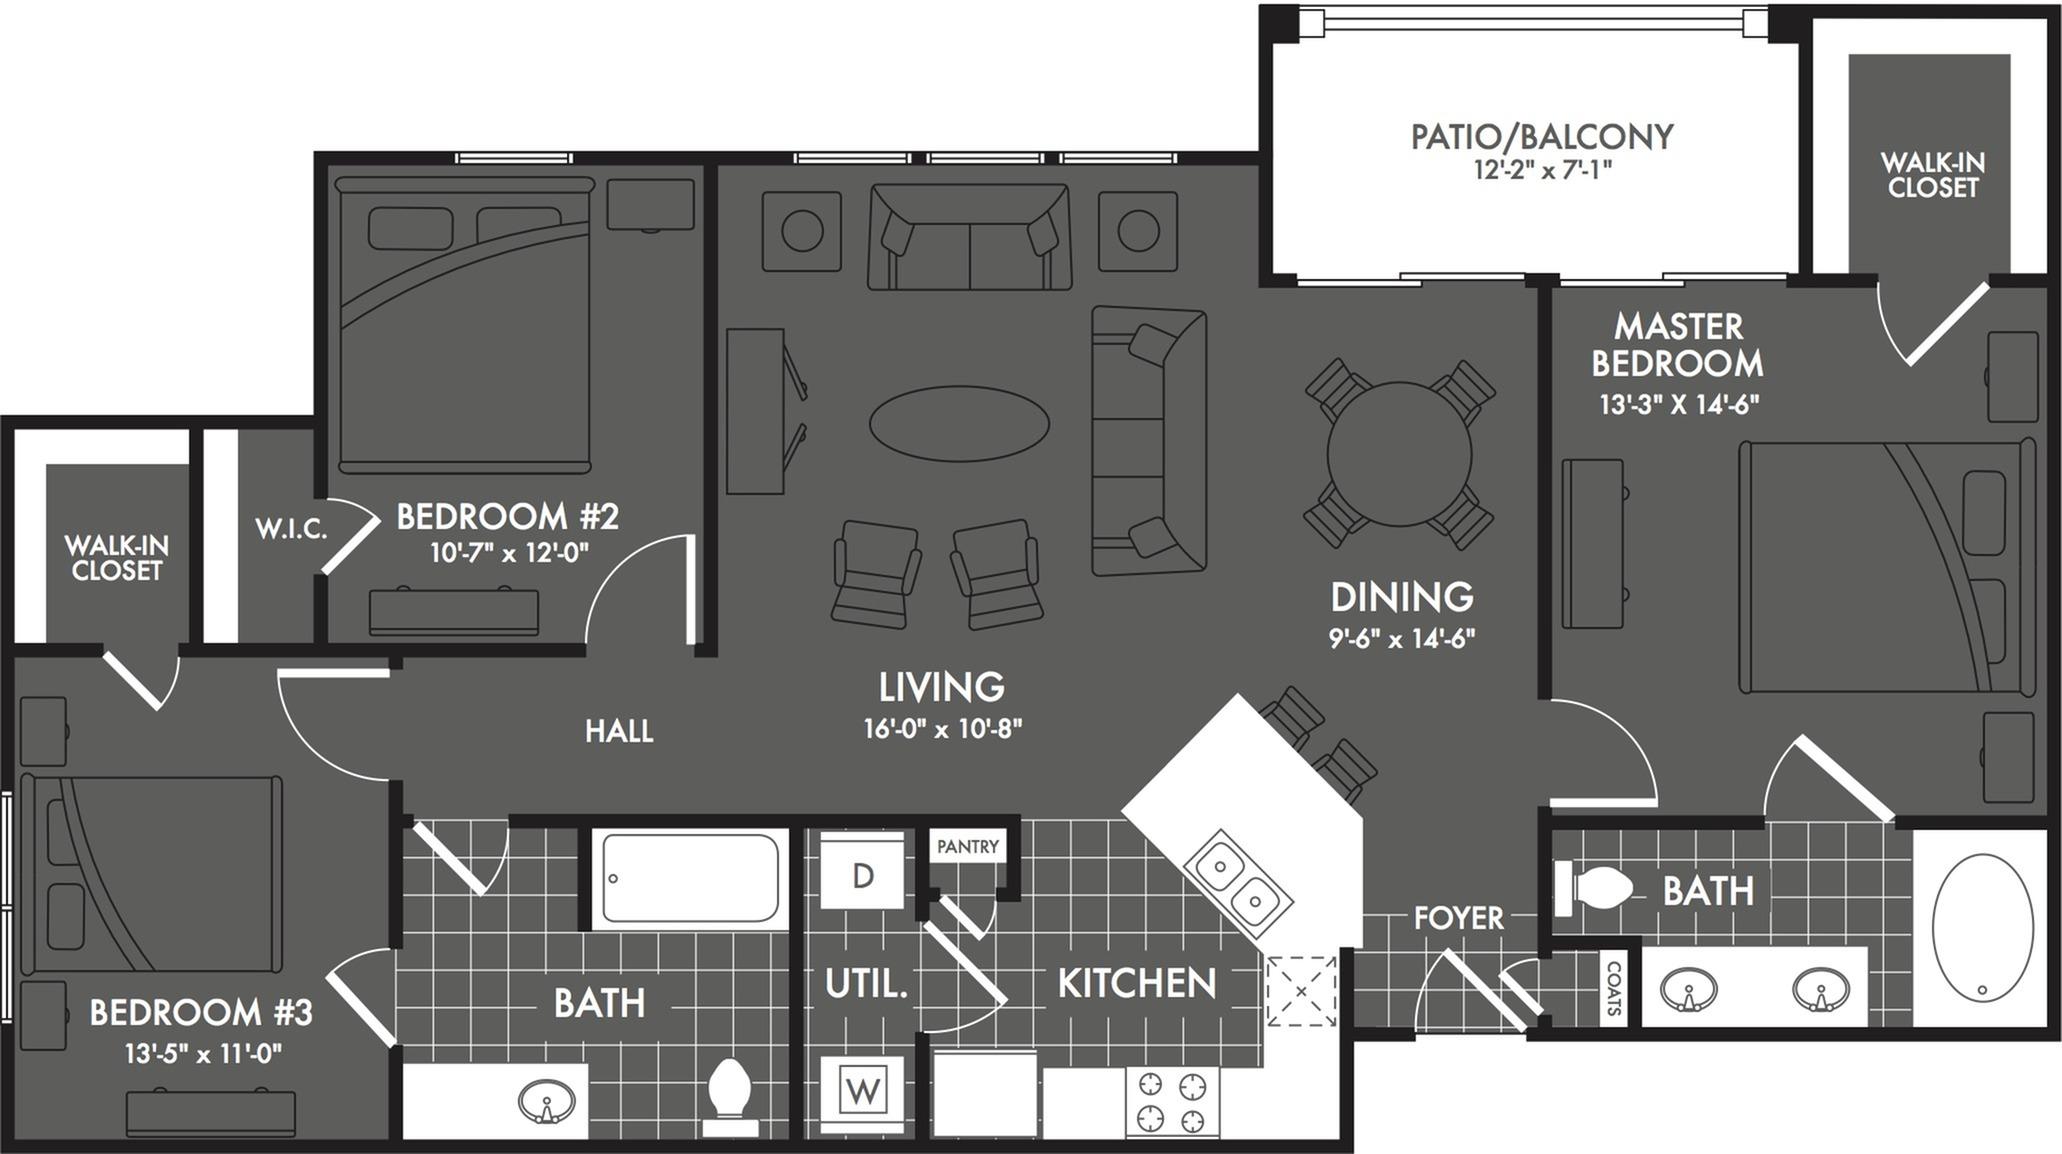 Studio apartments san antonio the estates at briggs ranch - 3 bedroom apartments san antonio ...